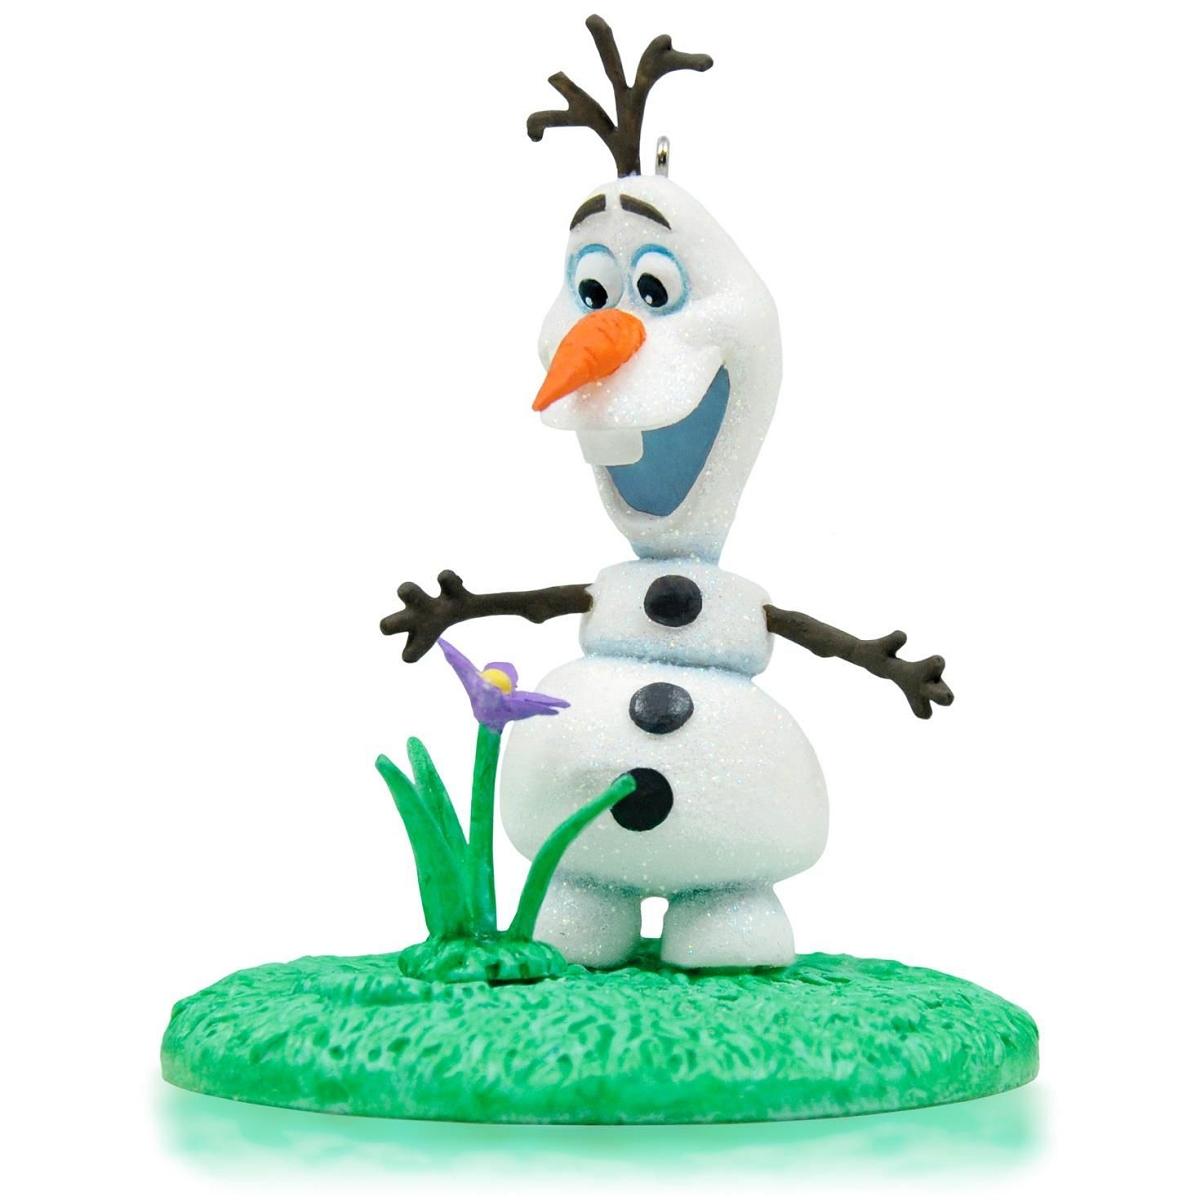 Disney frozen ornaments - 2015 Olaf In Summer Frozen Hallmark Keepsake Ornament Hooked On Hallmark Ornaments